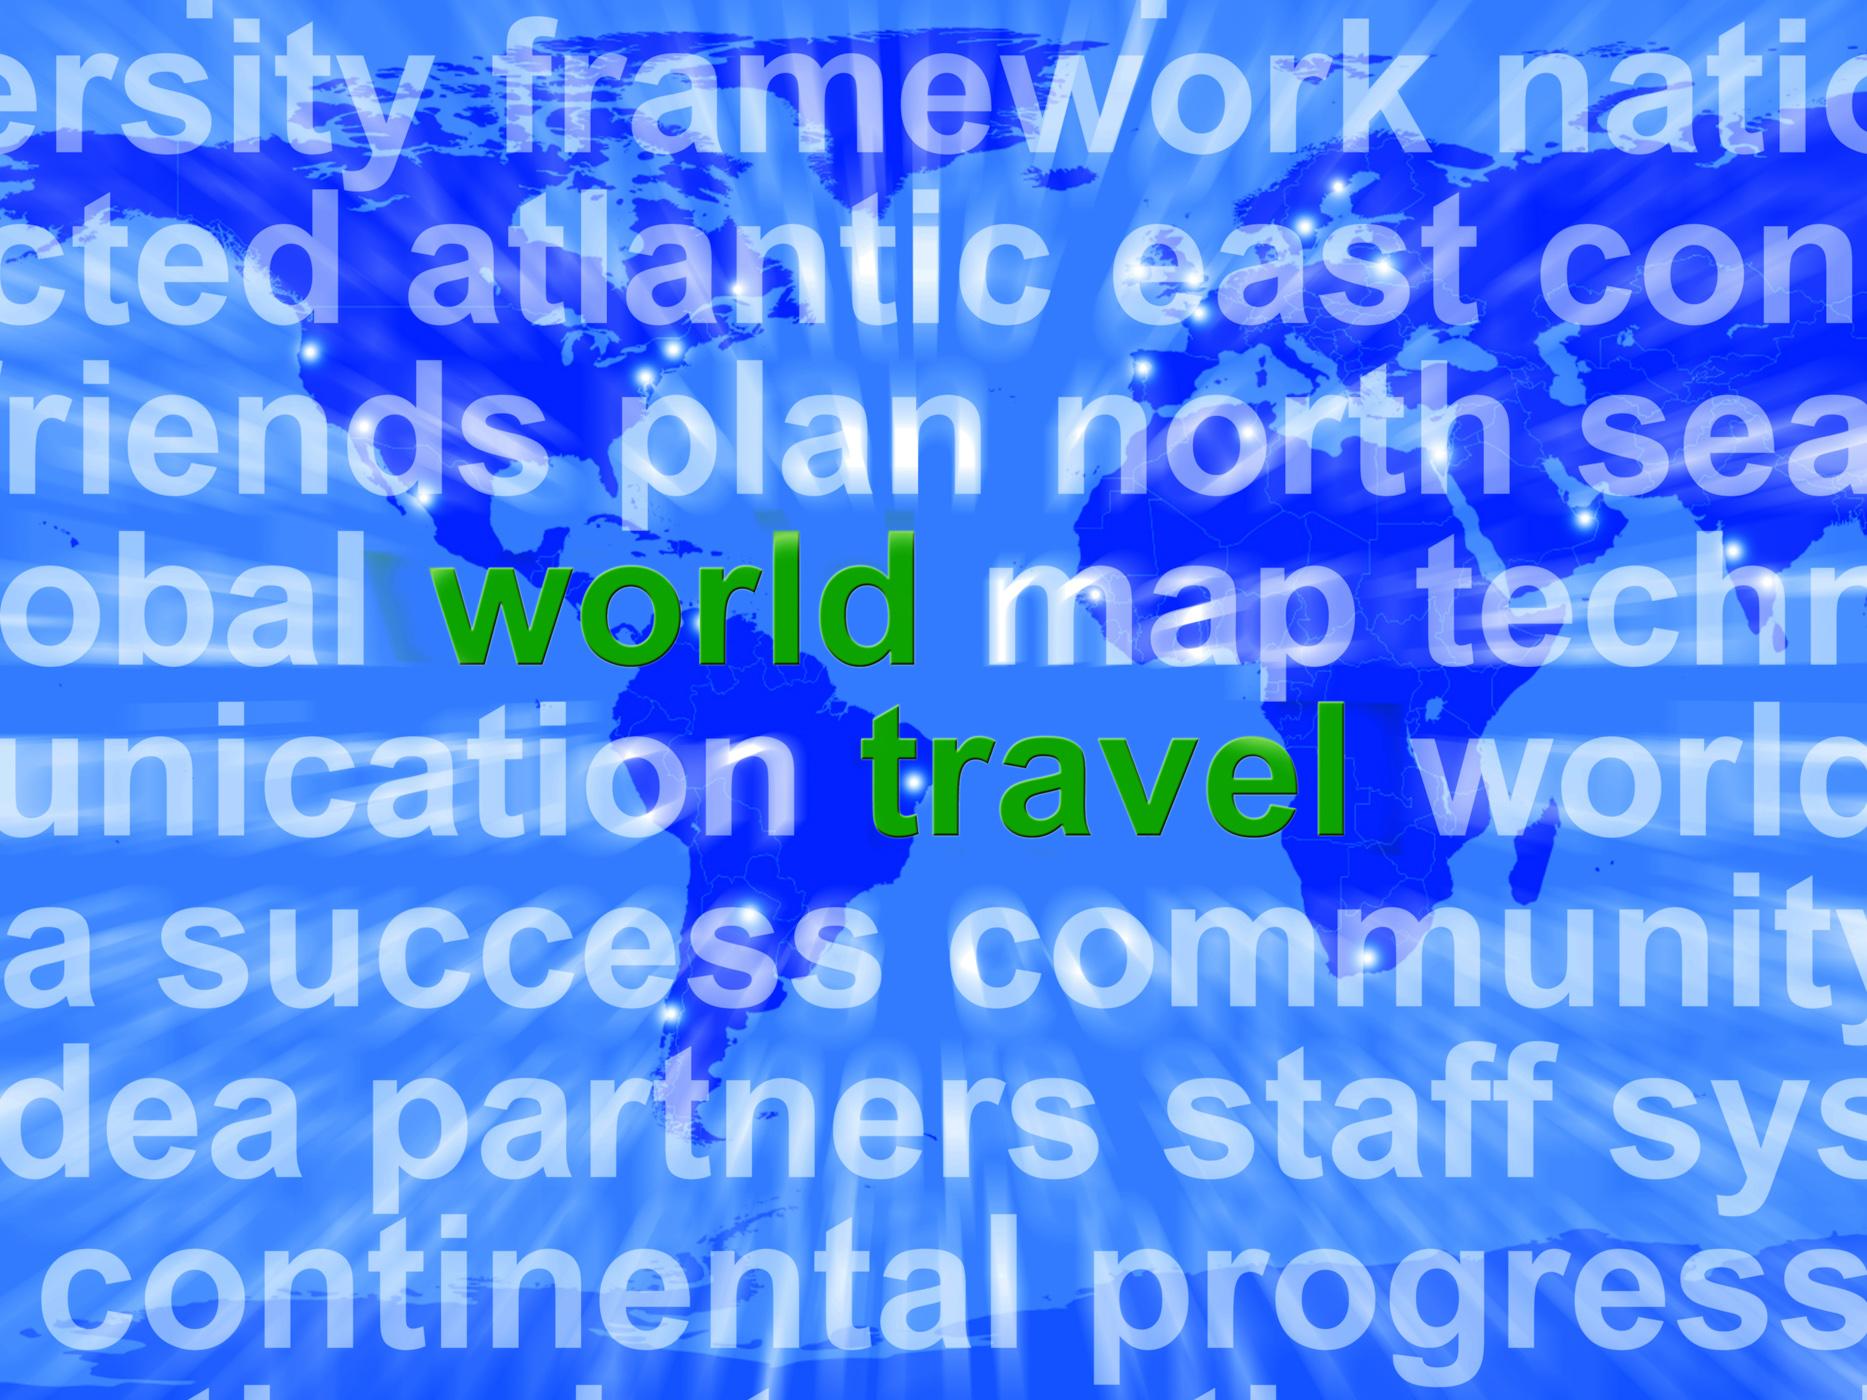 World travel words on map background showing international traveling photo